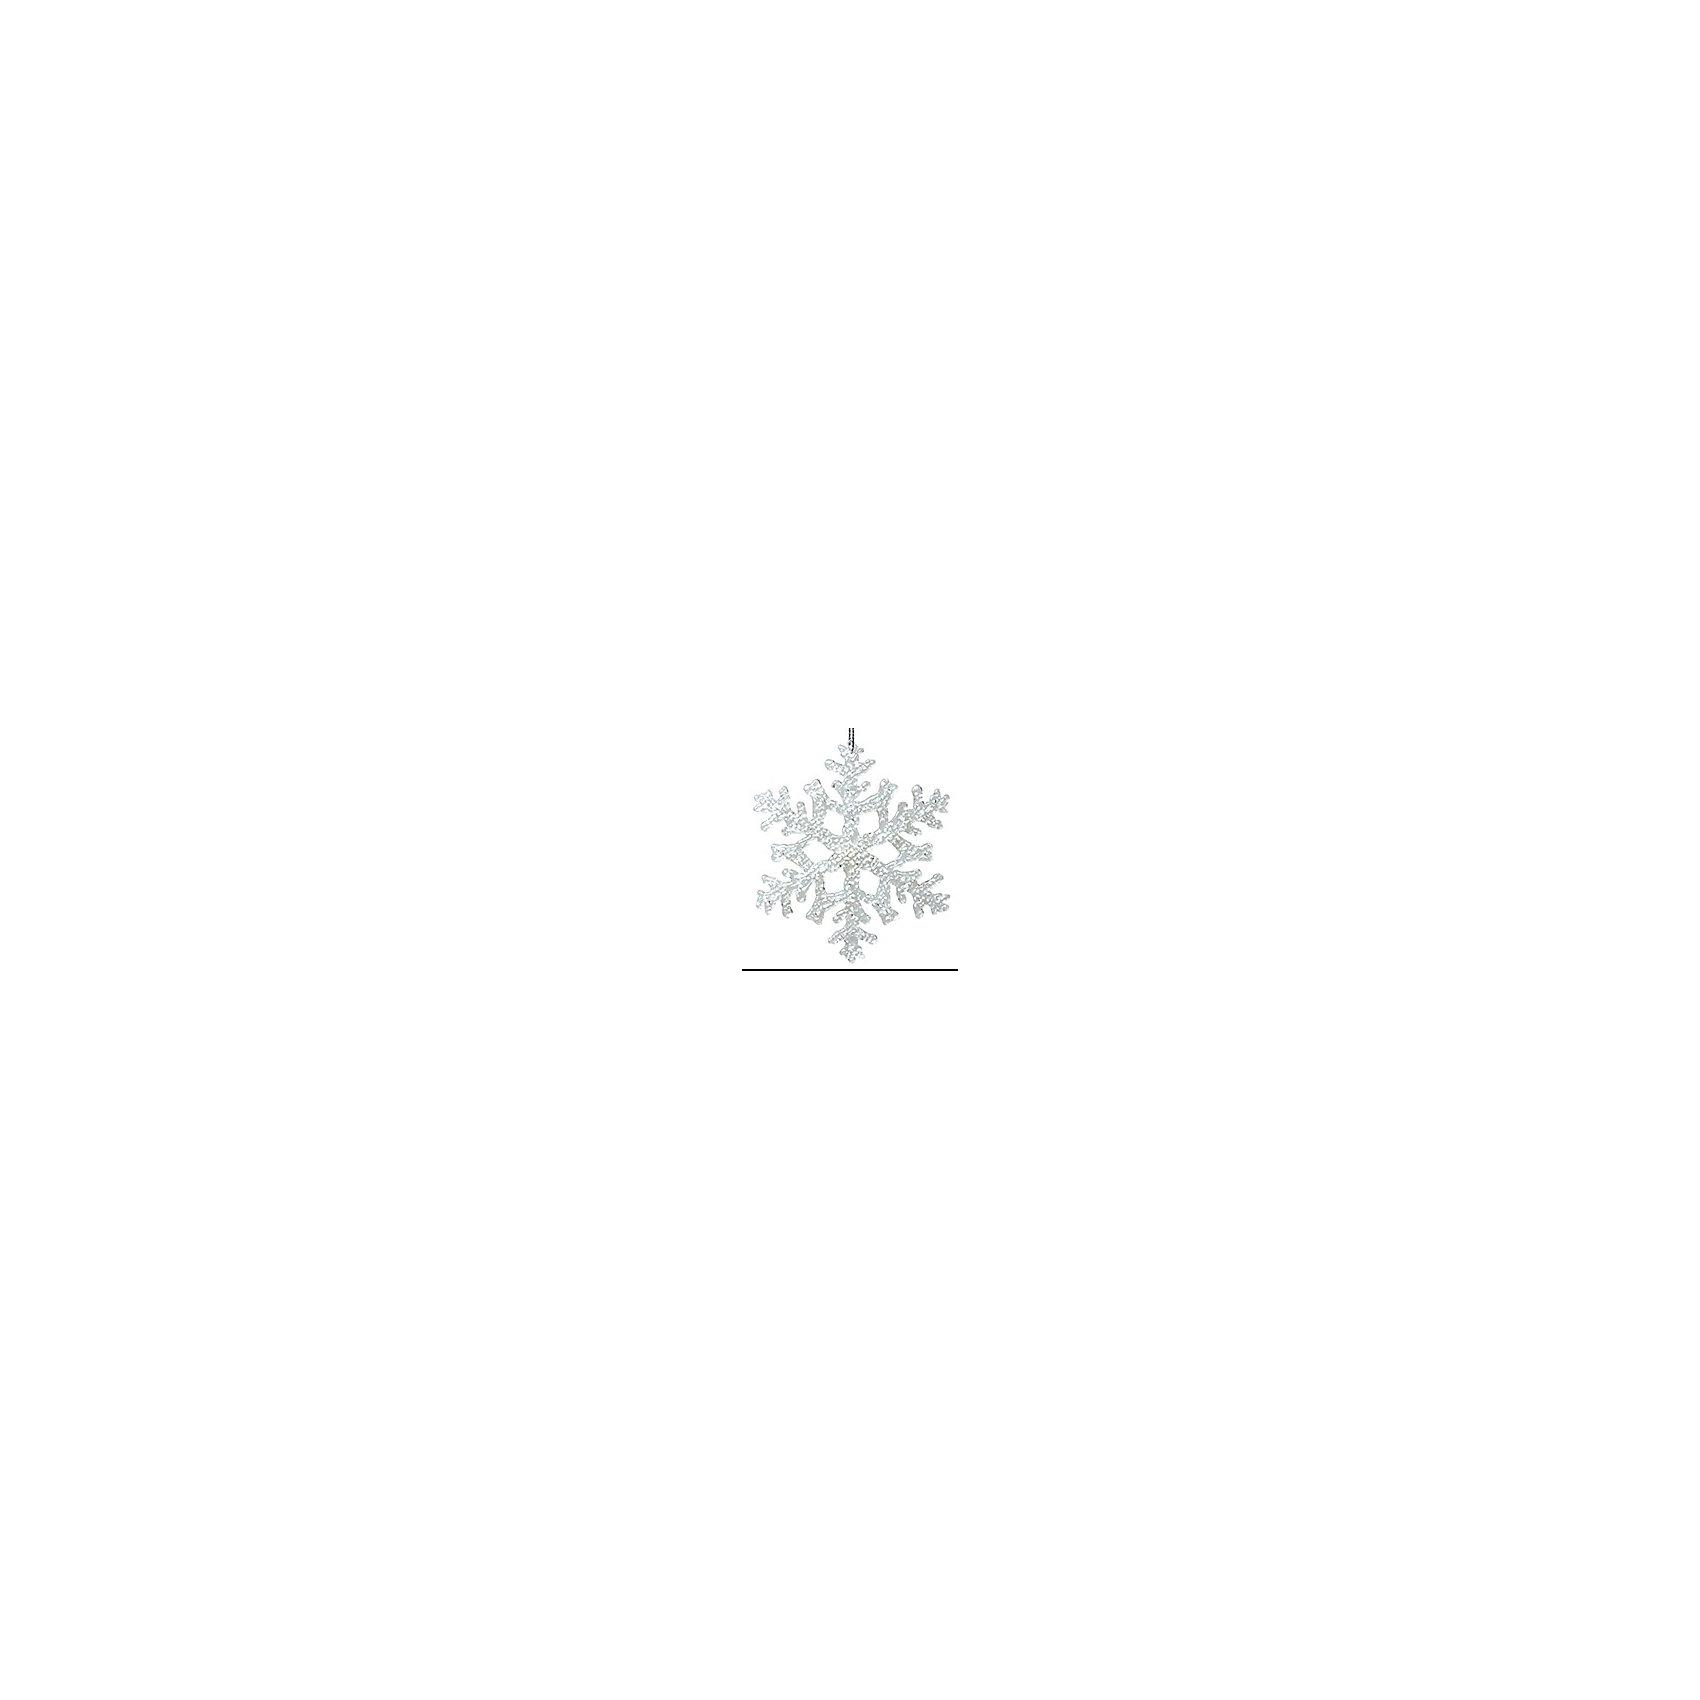 Набор снежинок 2 шт Classic white 10 смИзготовлено из пластмассы ёл. укр. набор снежинок 2шт.CLASSIC WHITE 10см<br><br>Ширина мм: 180<br>Глубина мм: 180<br>Высота мм: 5<br>Вес г: 100<br>Возраст от месяцев: 36<br>Возраст до месяцев: 2147483647<br>Пол: Унисекс<br>Возраст: Детский<br>SKU: 5101076